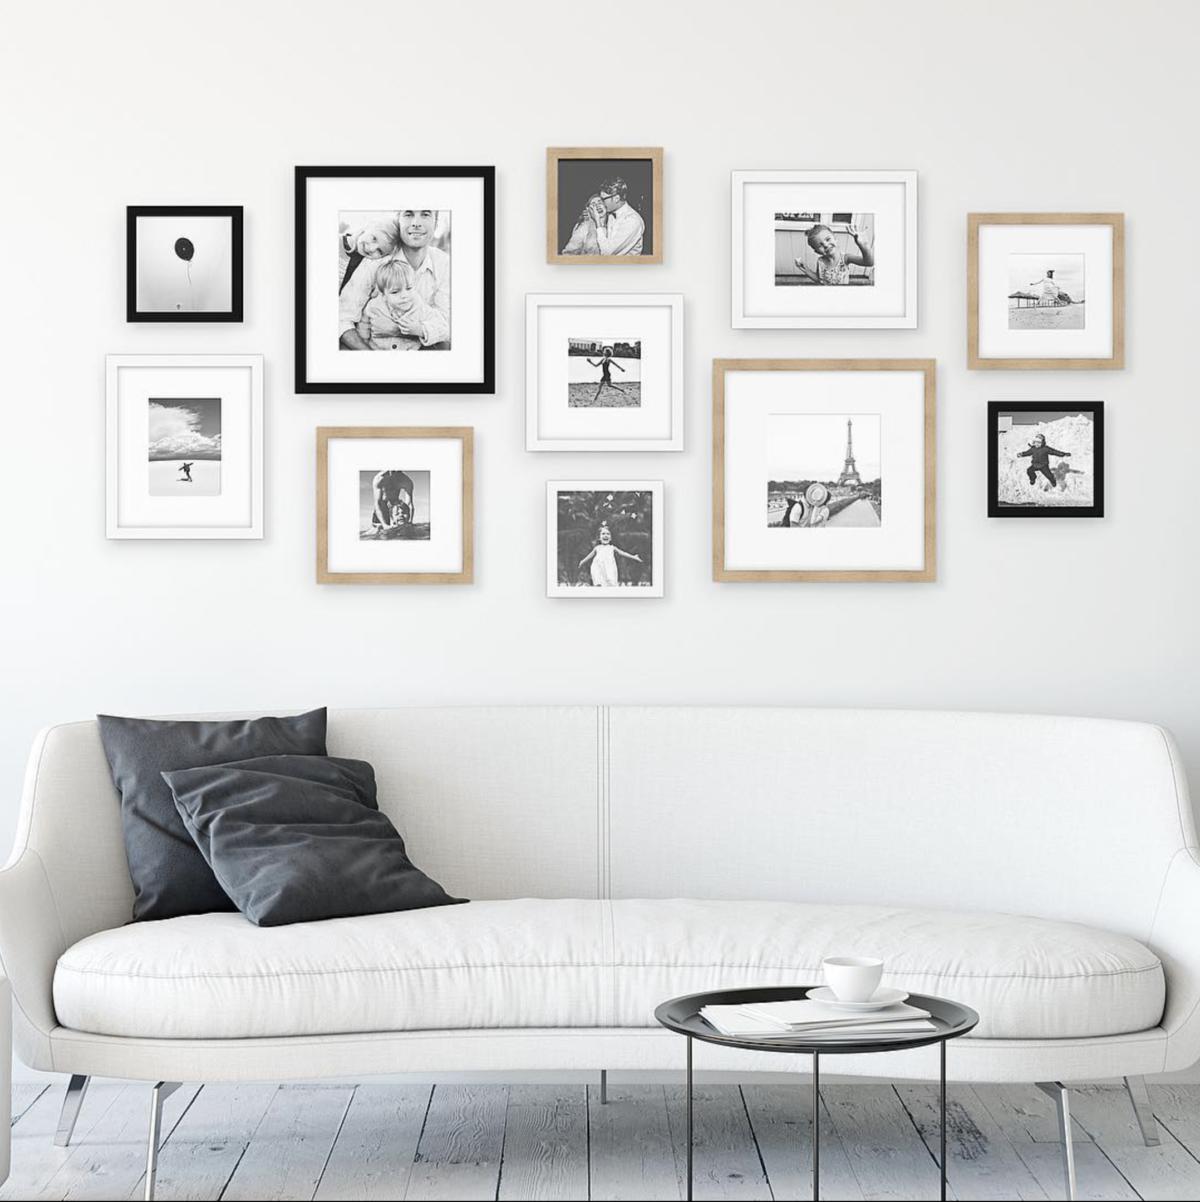 Australia Gallery Wall Styling Art design Framefox frames